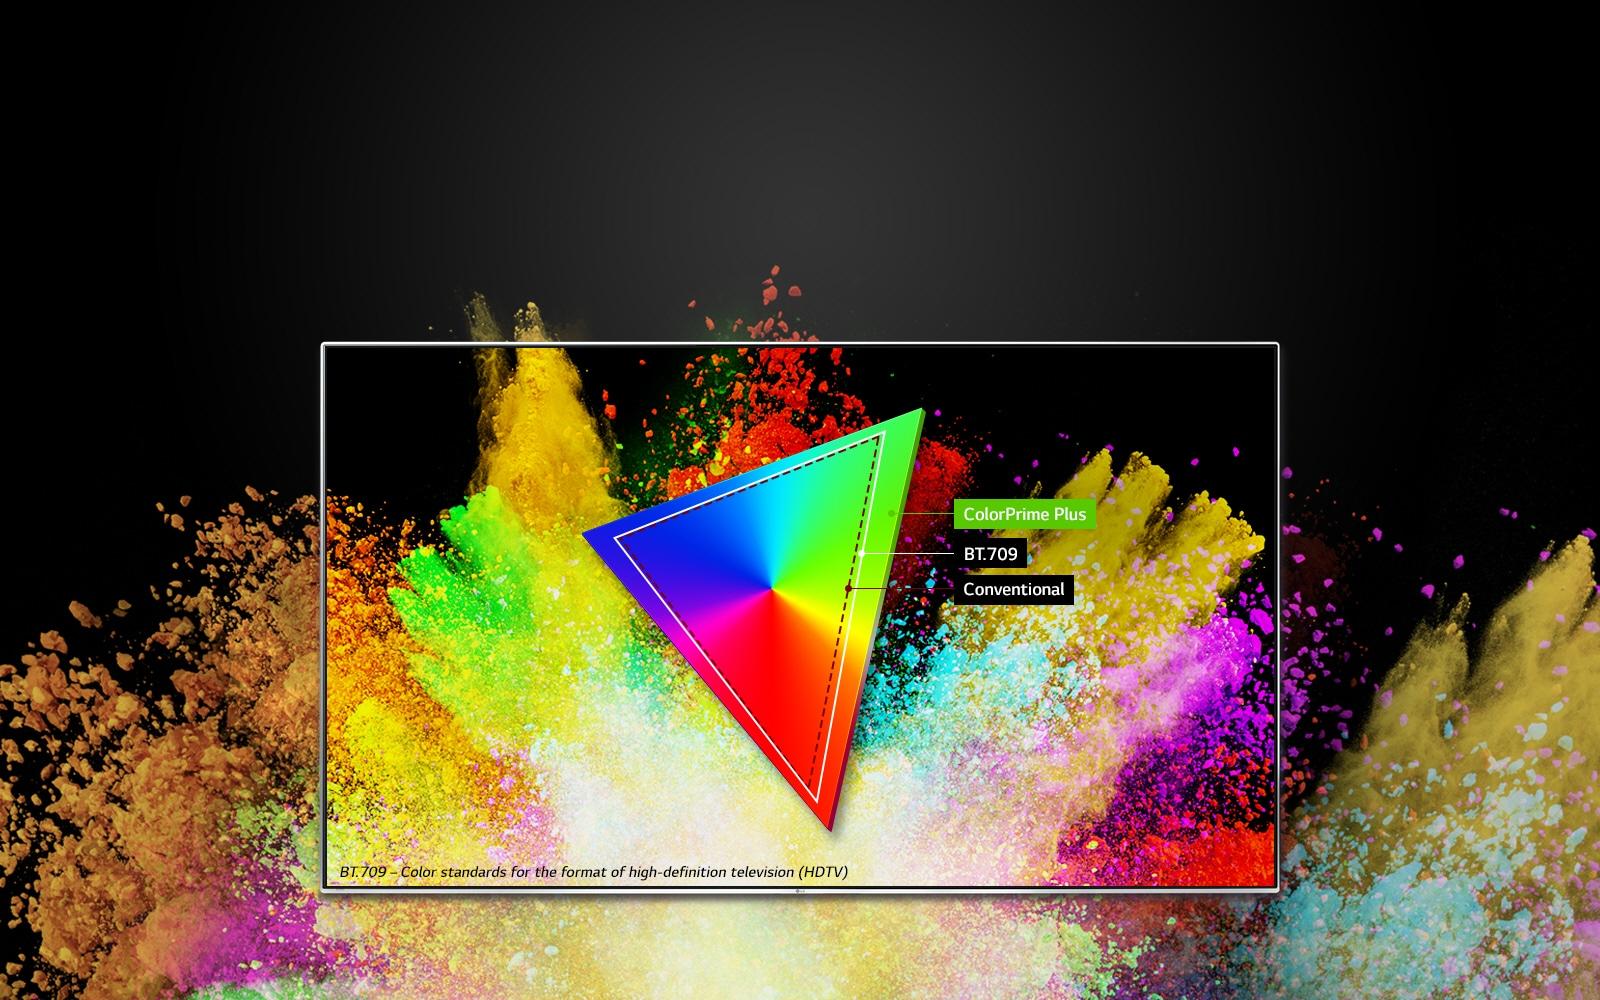 ColorPrime Plus